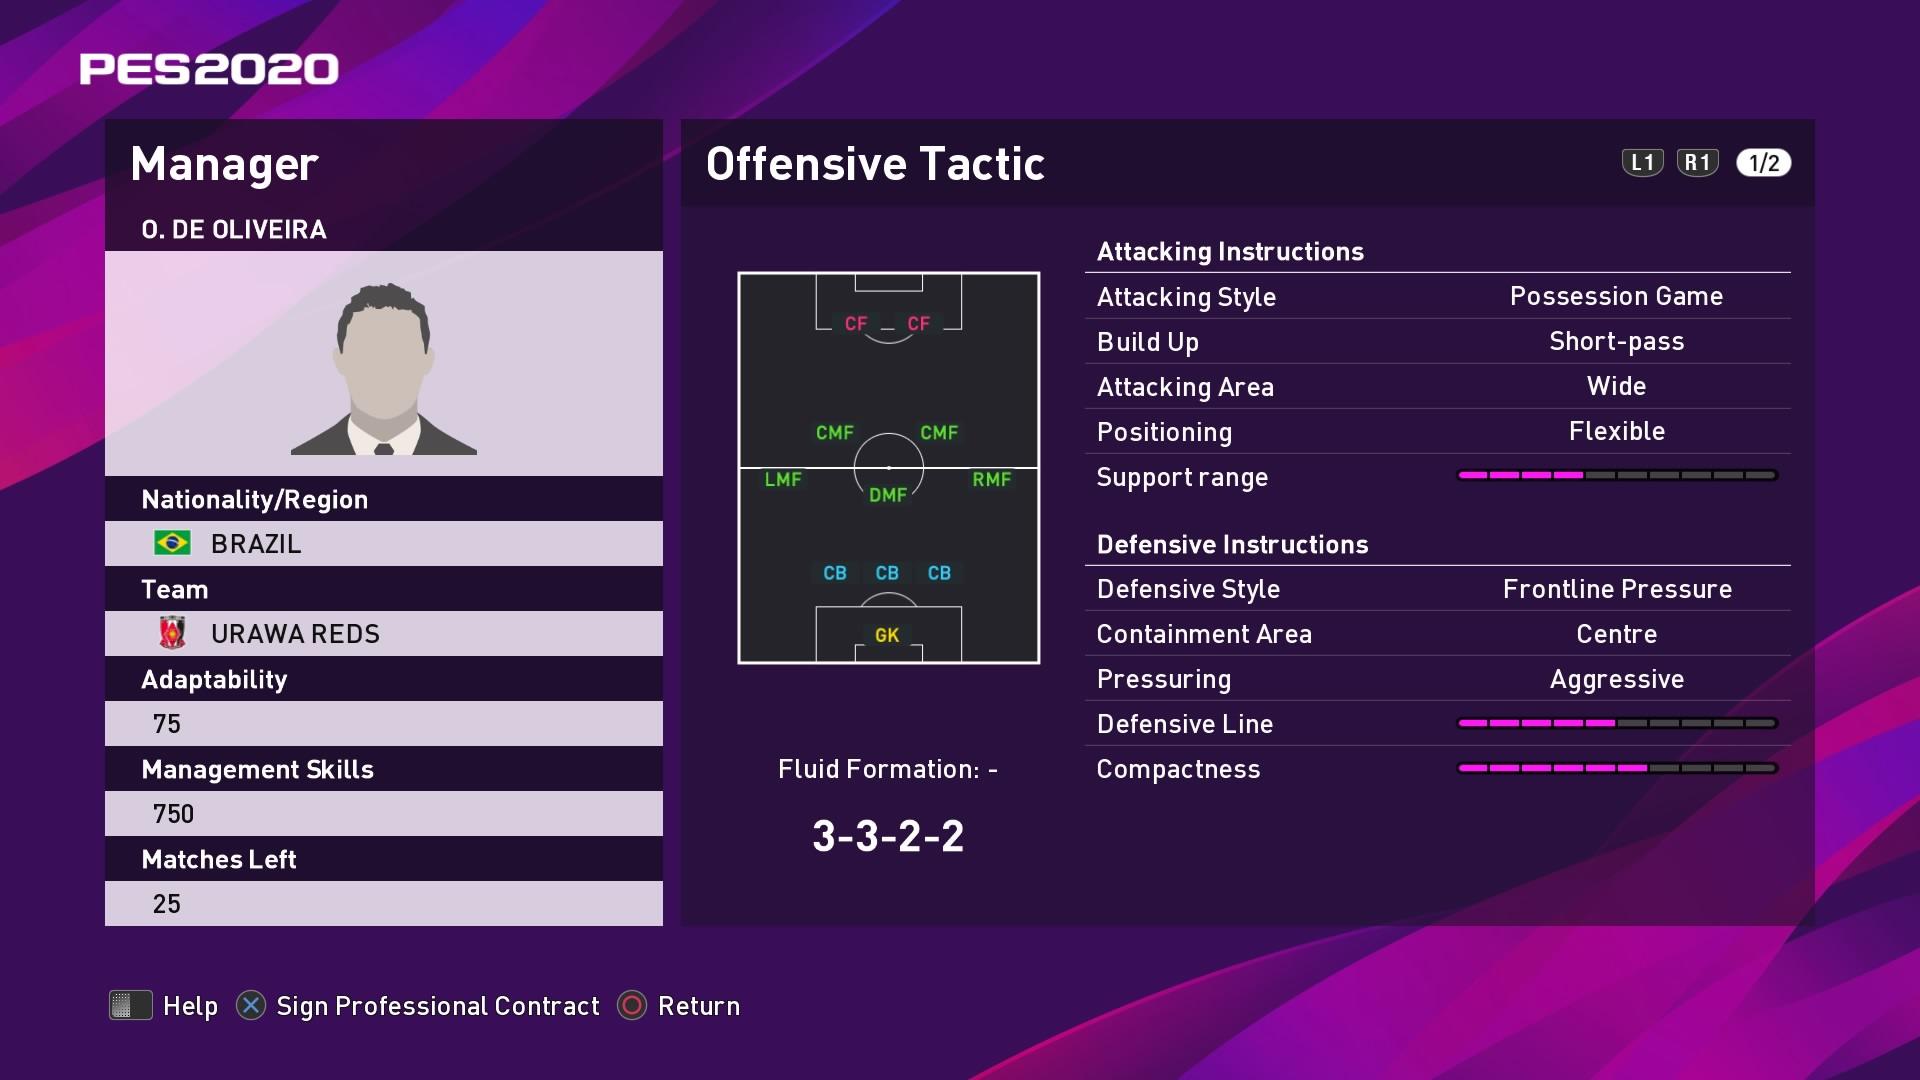 O. de Oliveira (Oswaldo de Oliveira) Offensive Tactic in PES 2020 myClub